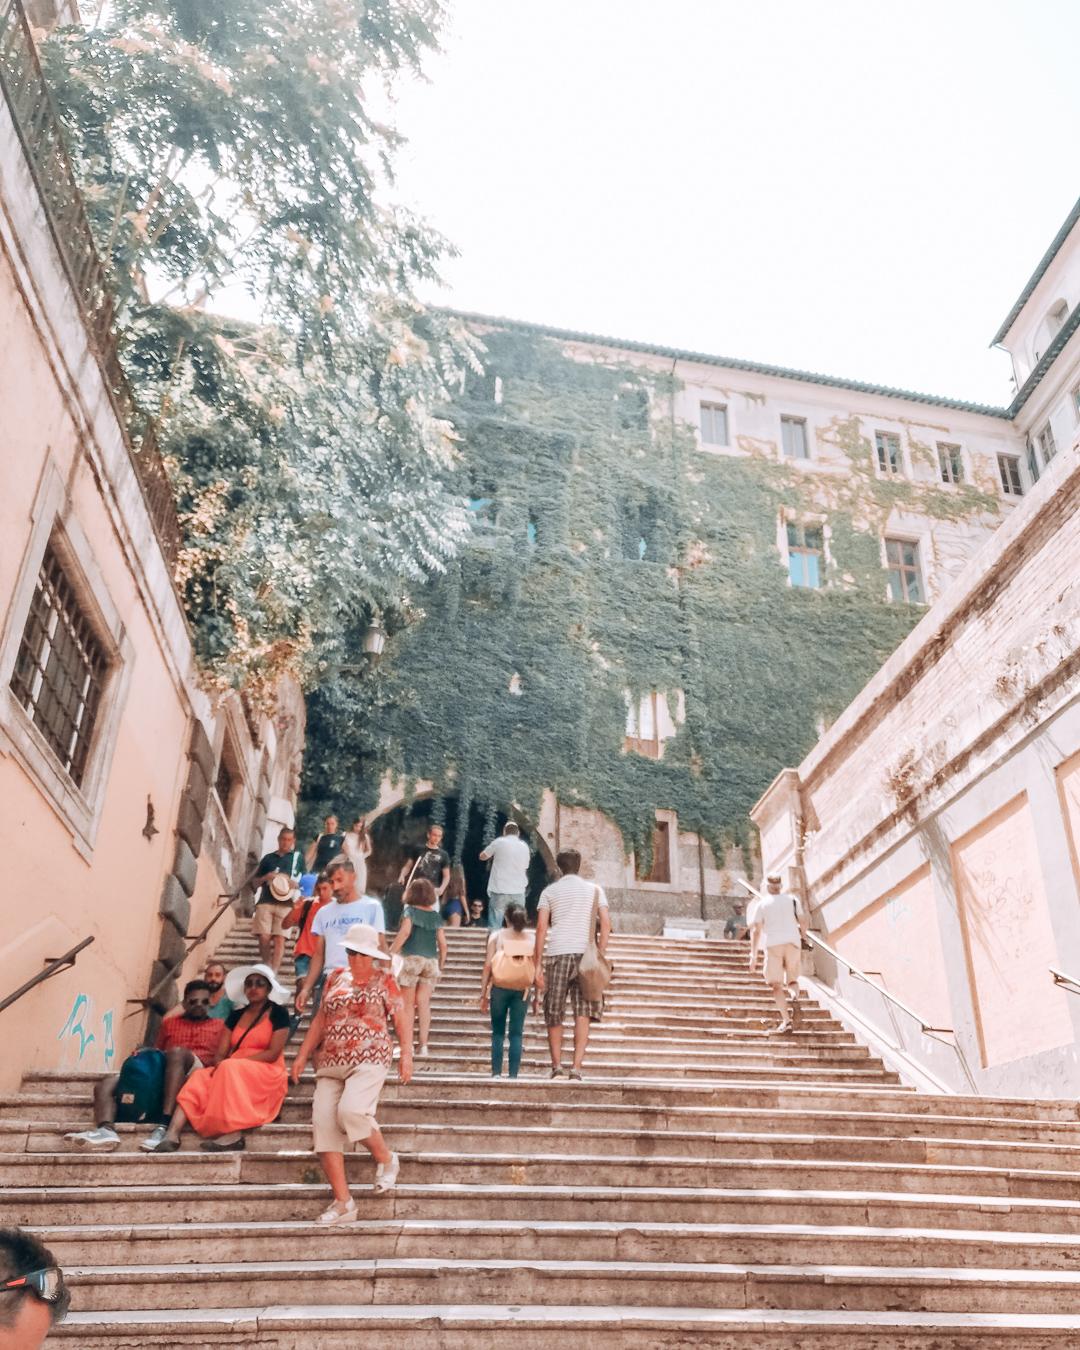 The Borgia Stairs in Rome